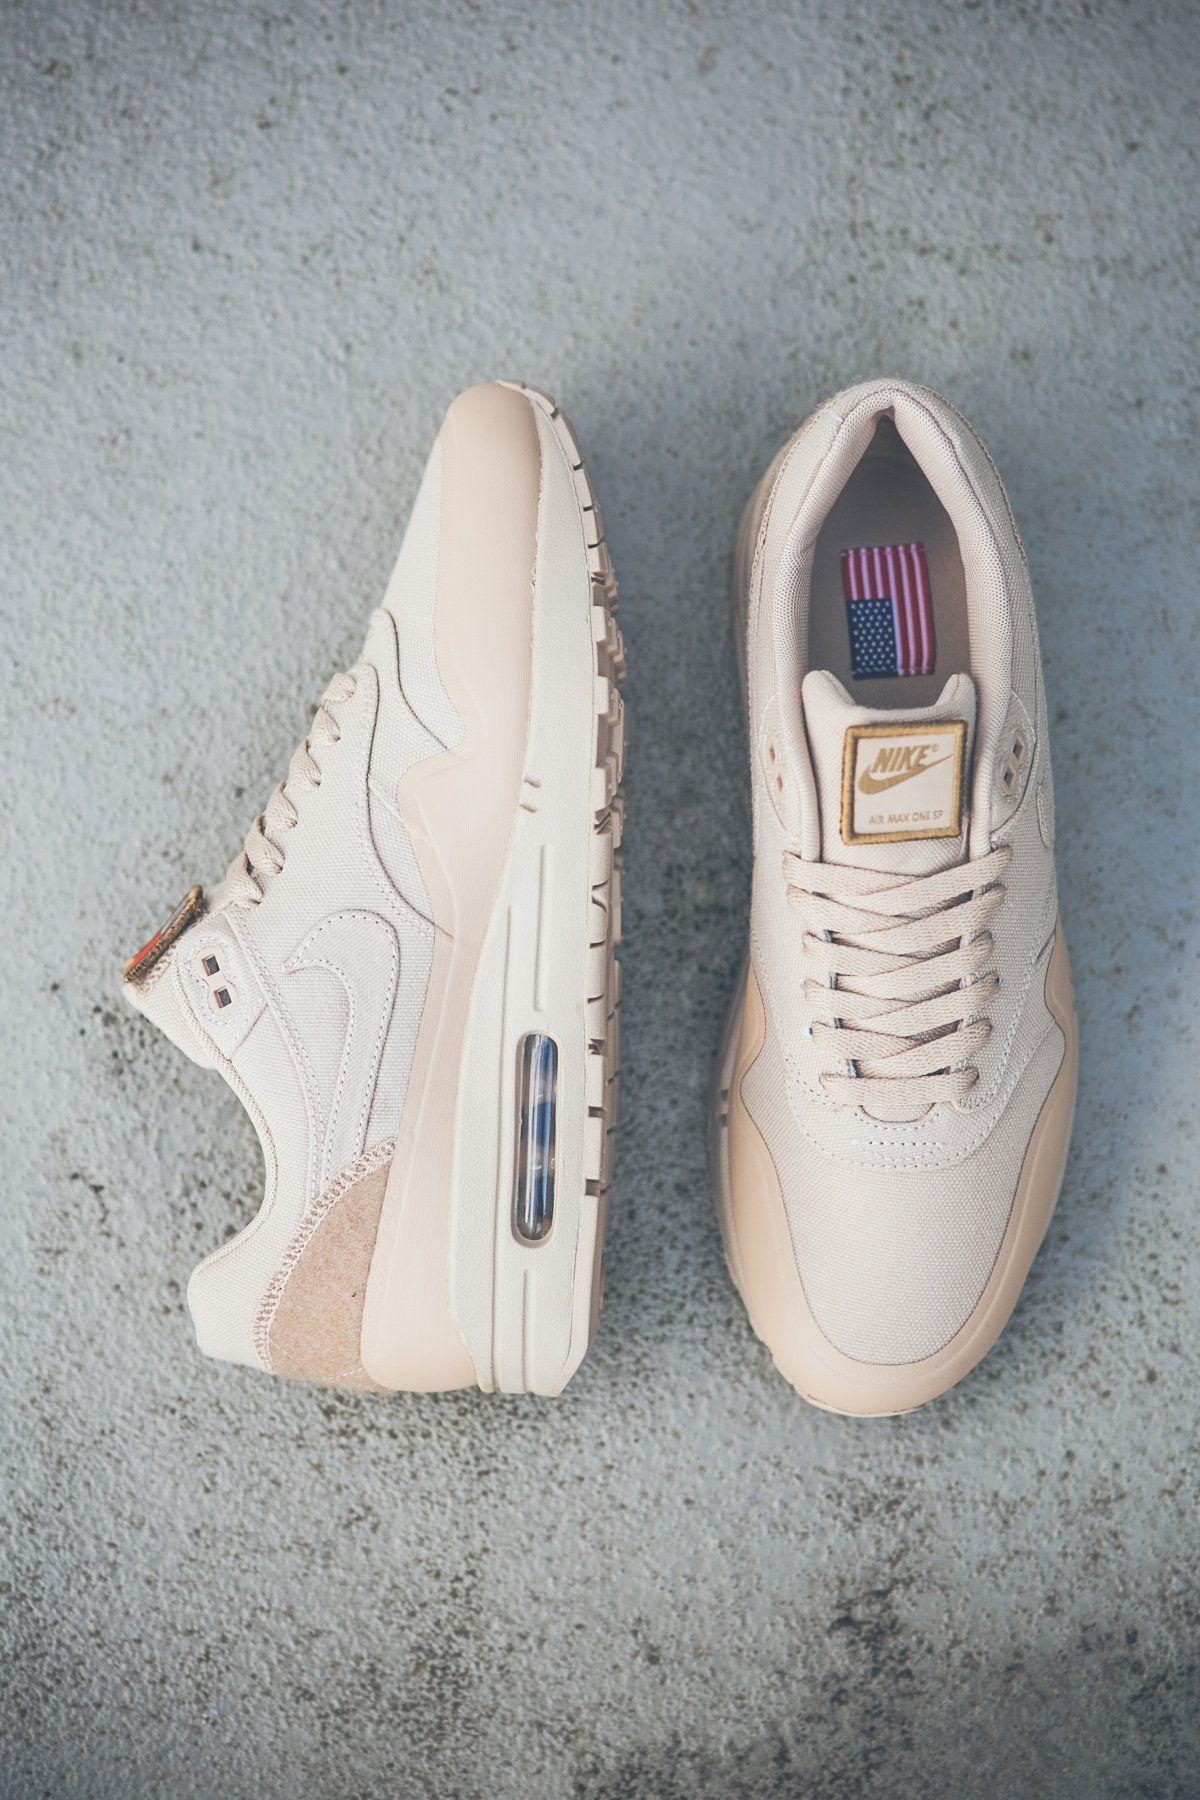 quality design aac09 42bd3 Nike Air Max 1 SP